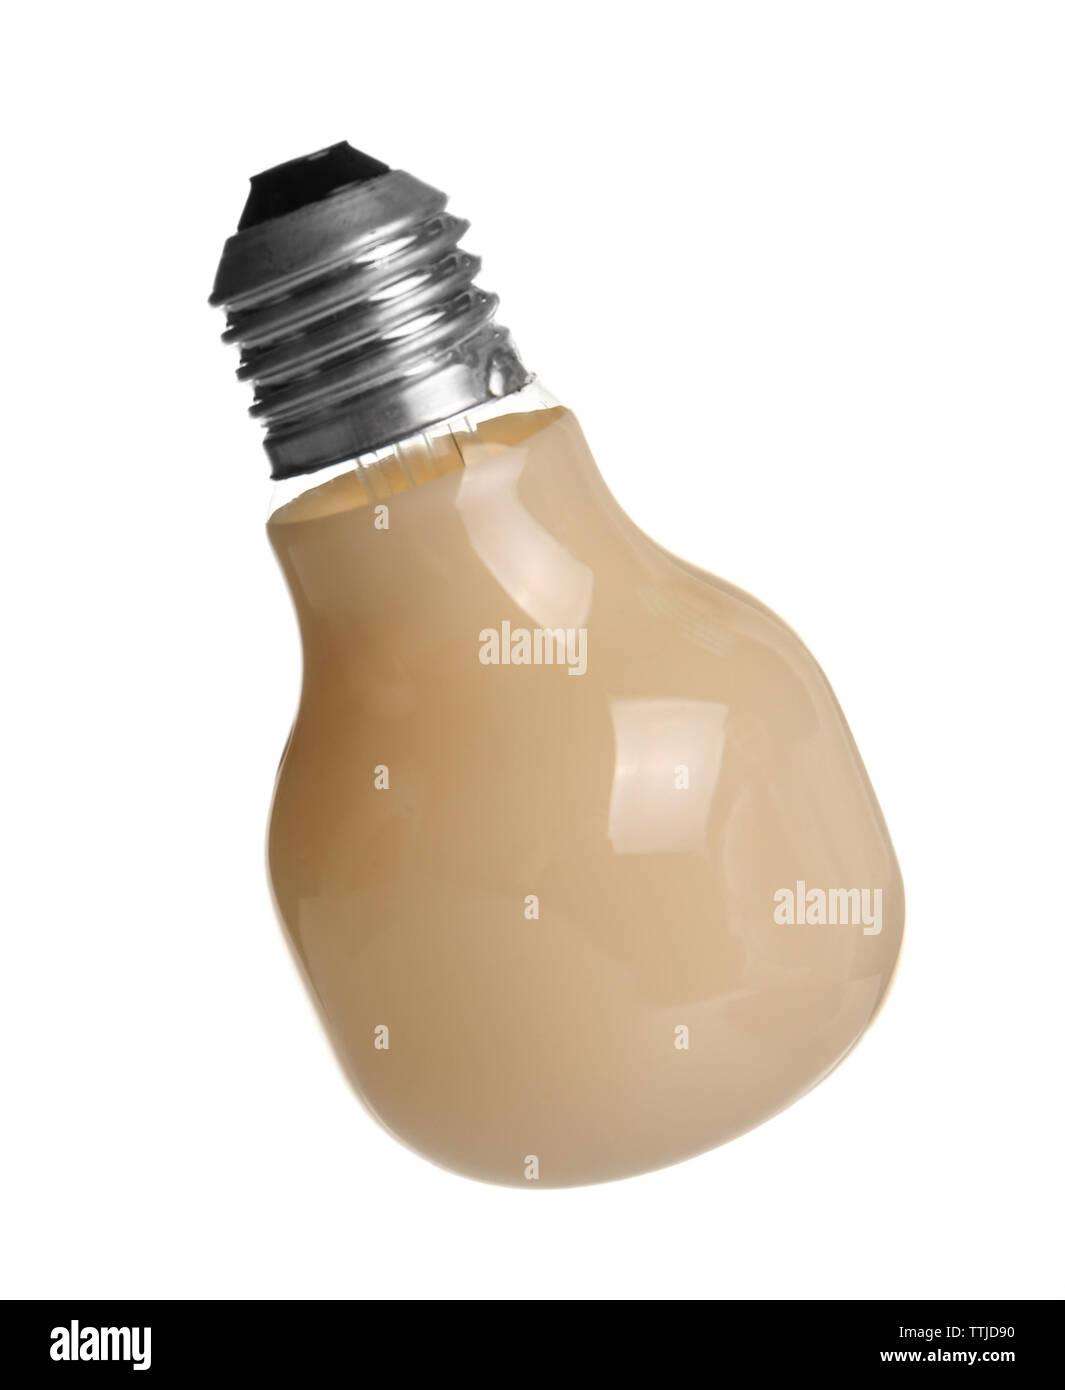 Decorative beige light bulb, isolated on white - Stock Image